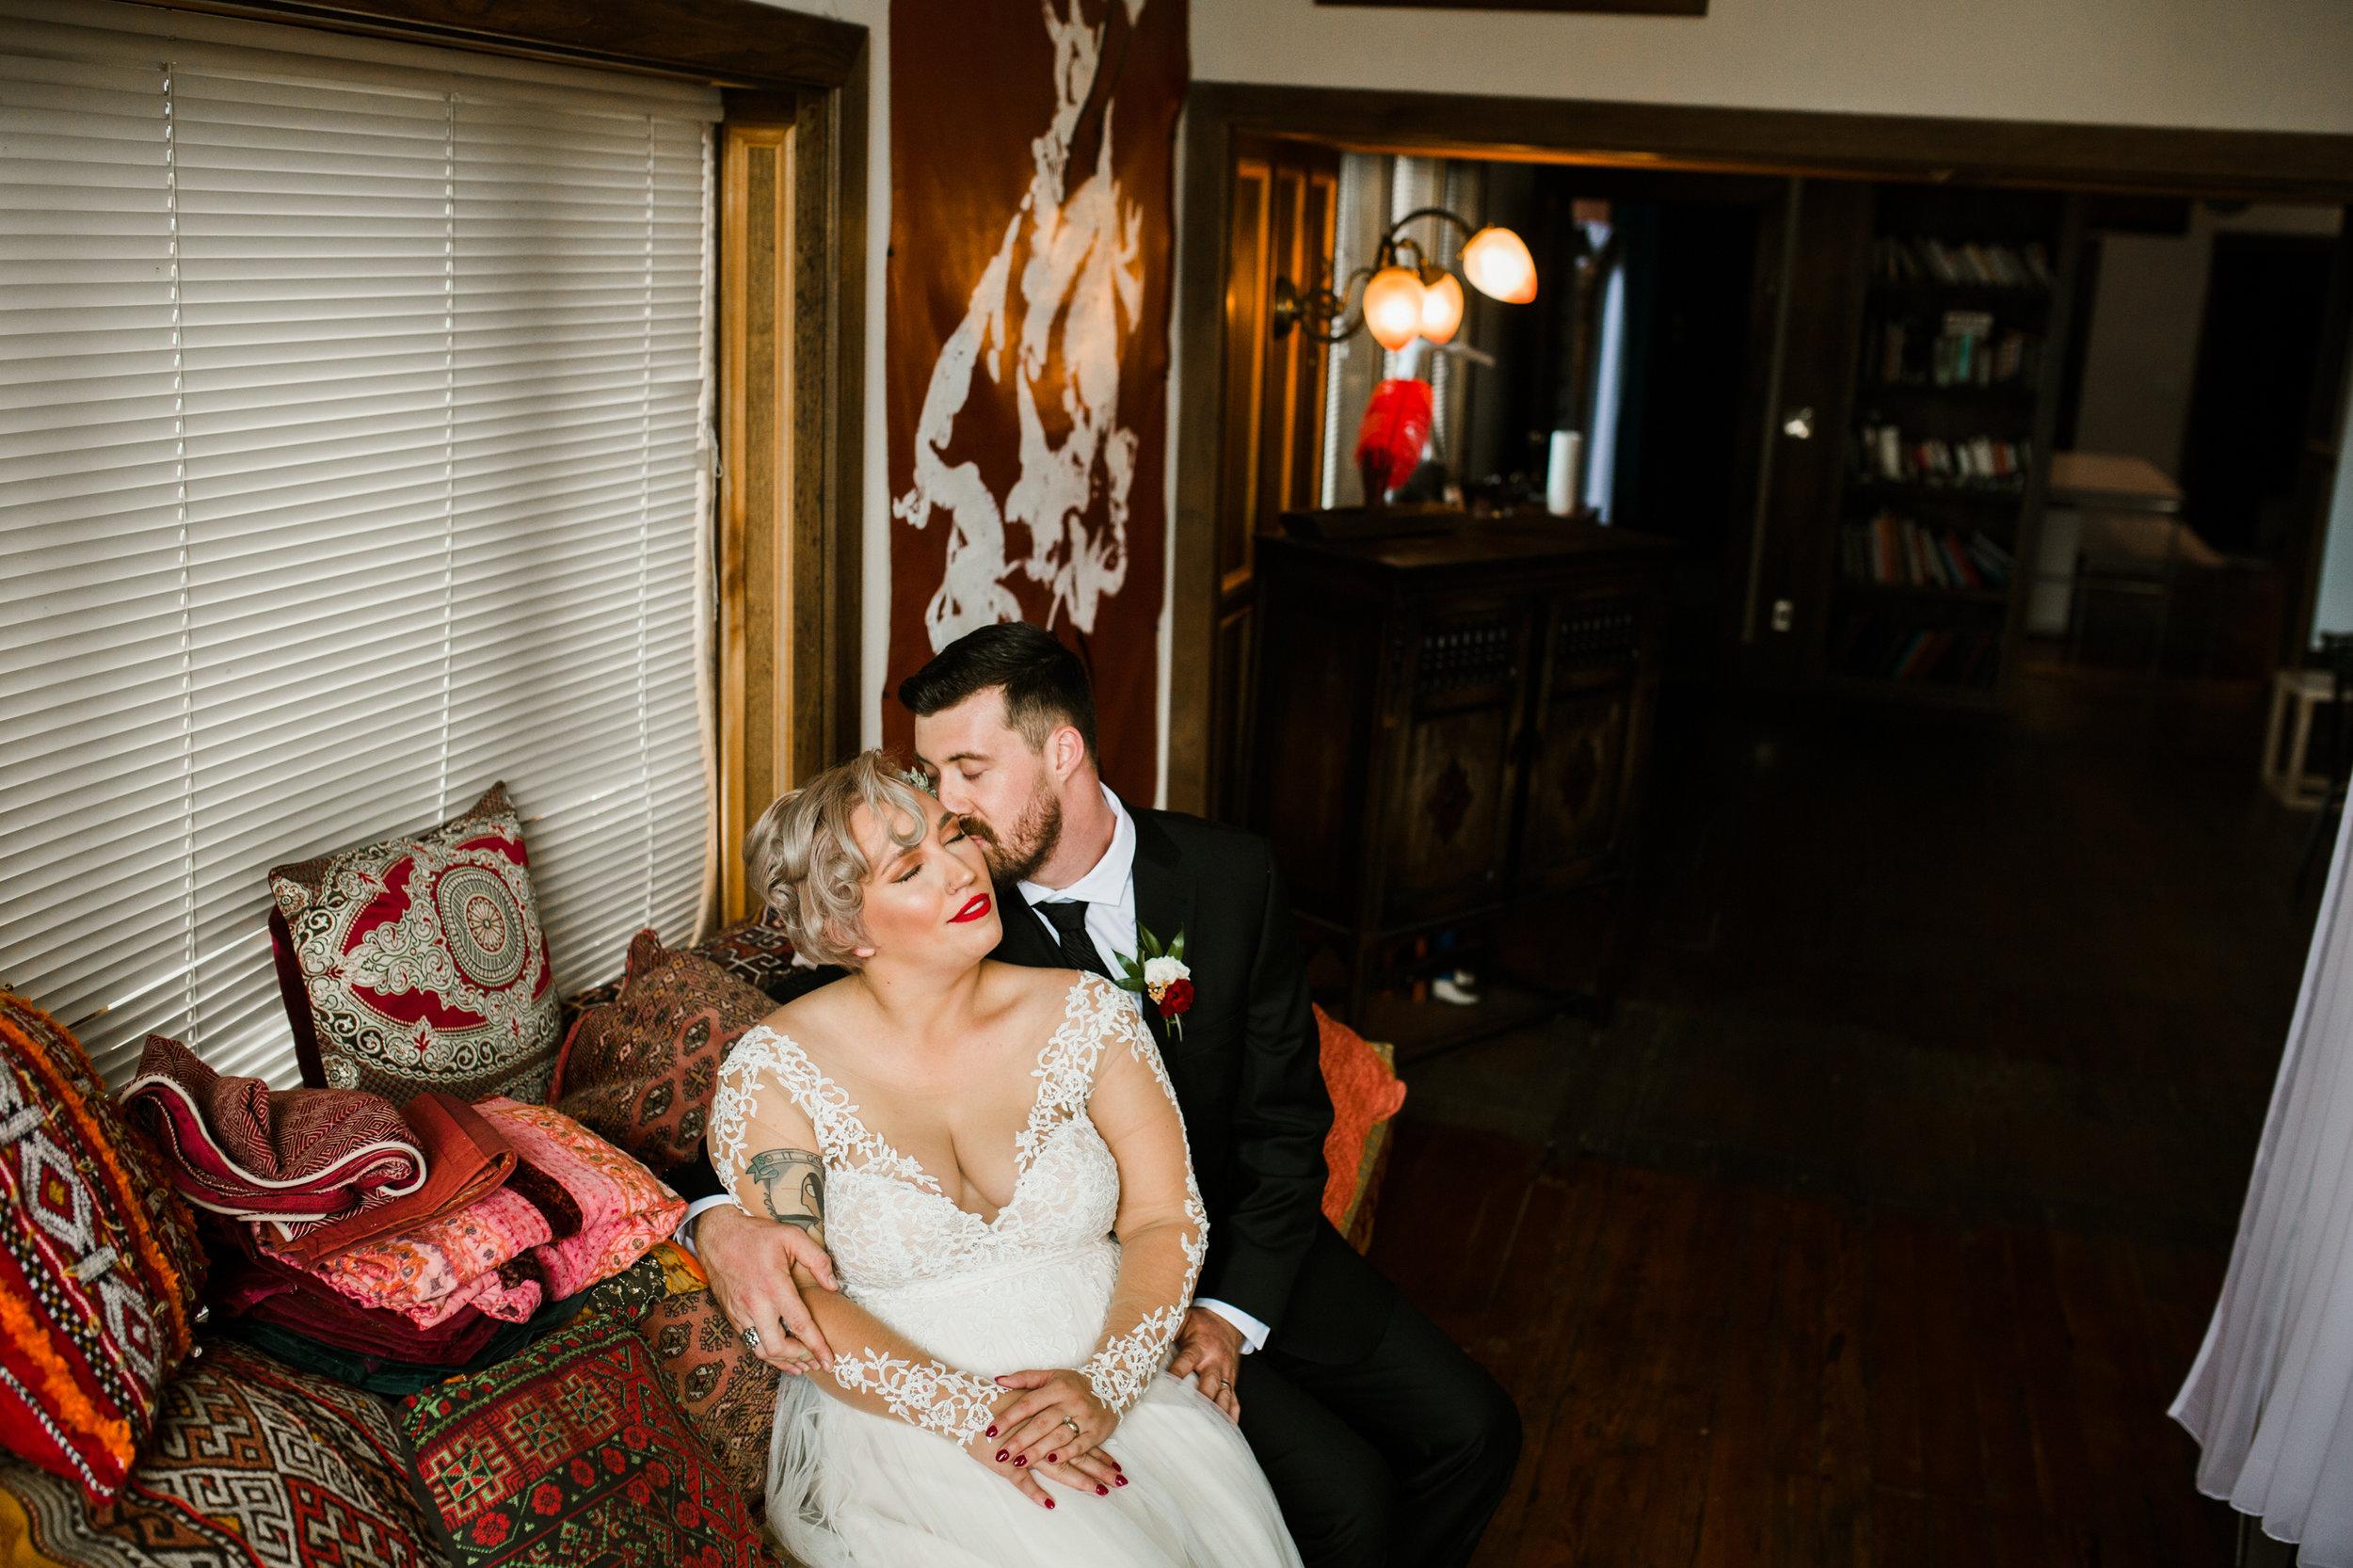 Kentucky Wedding Louisville Wedding Photographer 2018 Crystal Ludwick Photo Louisville Wedding Photographer Kentucky Wedding Photographer (91 of 105).jpg